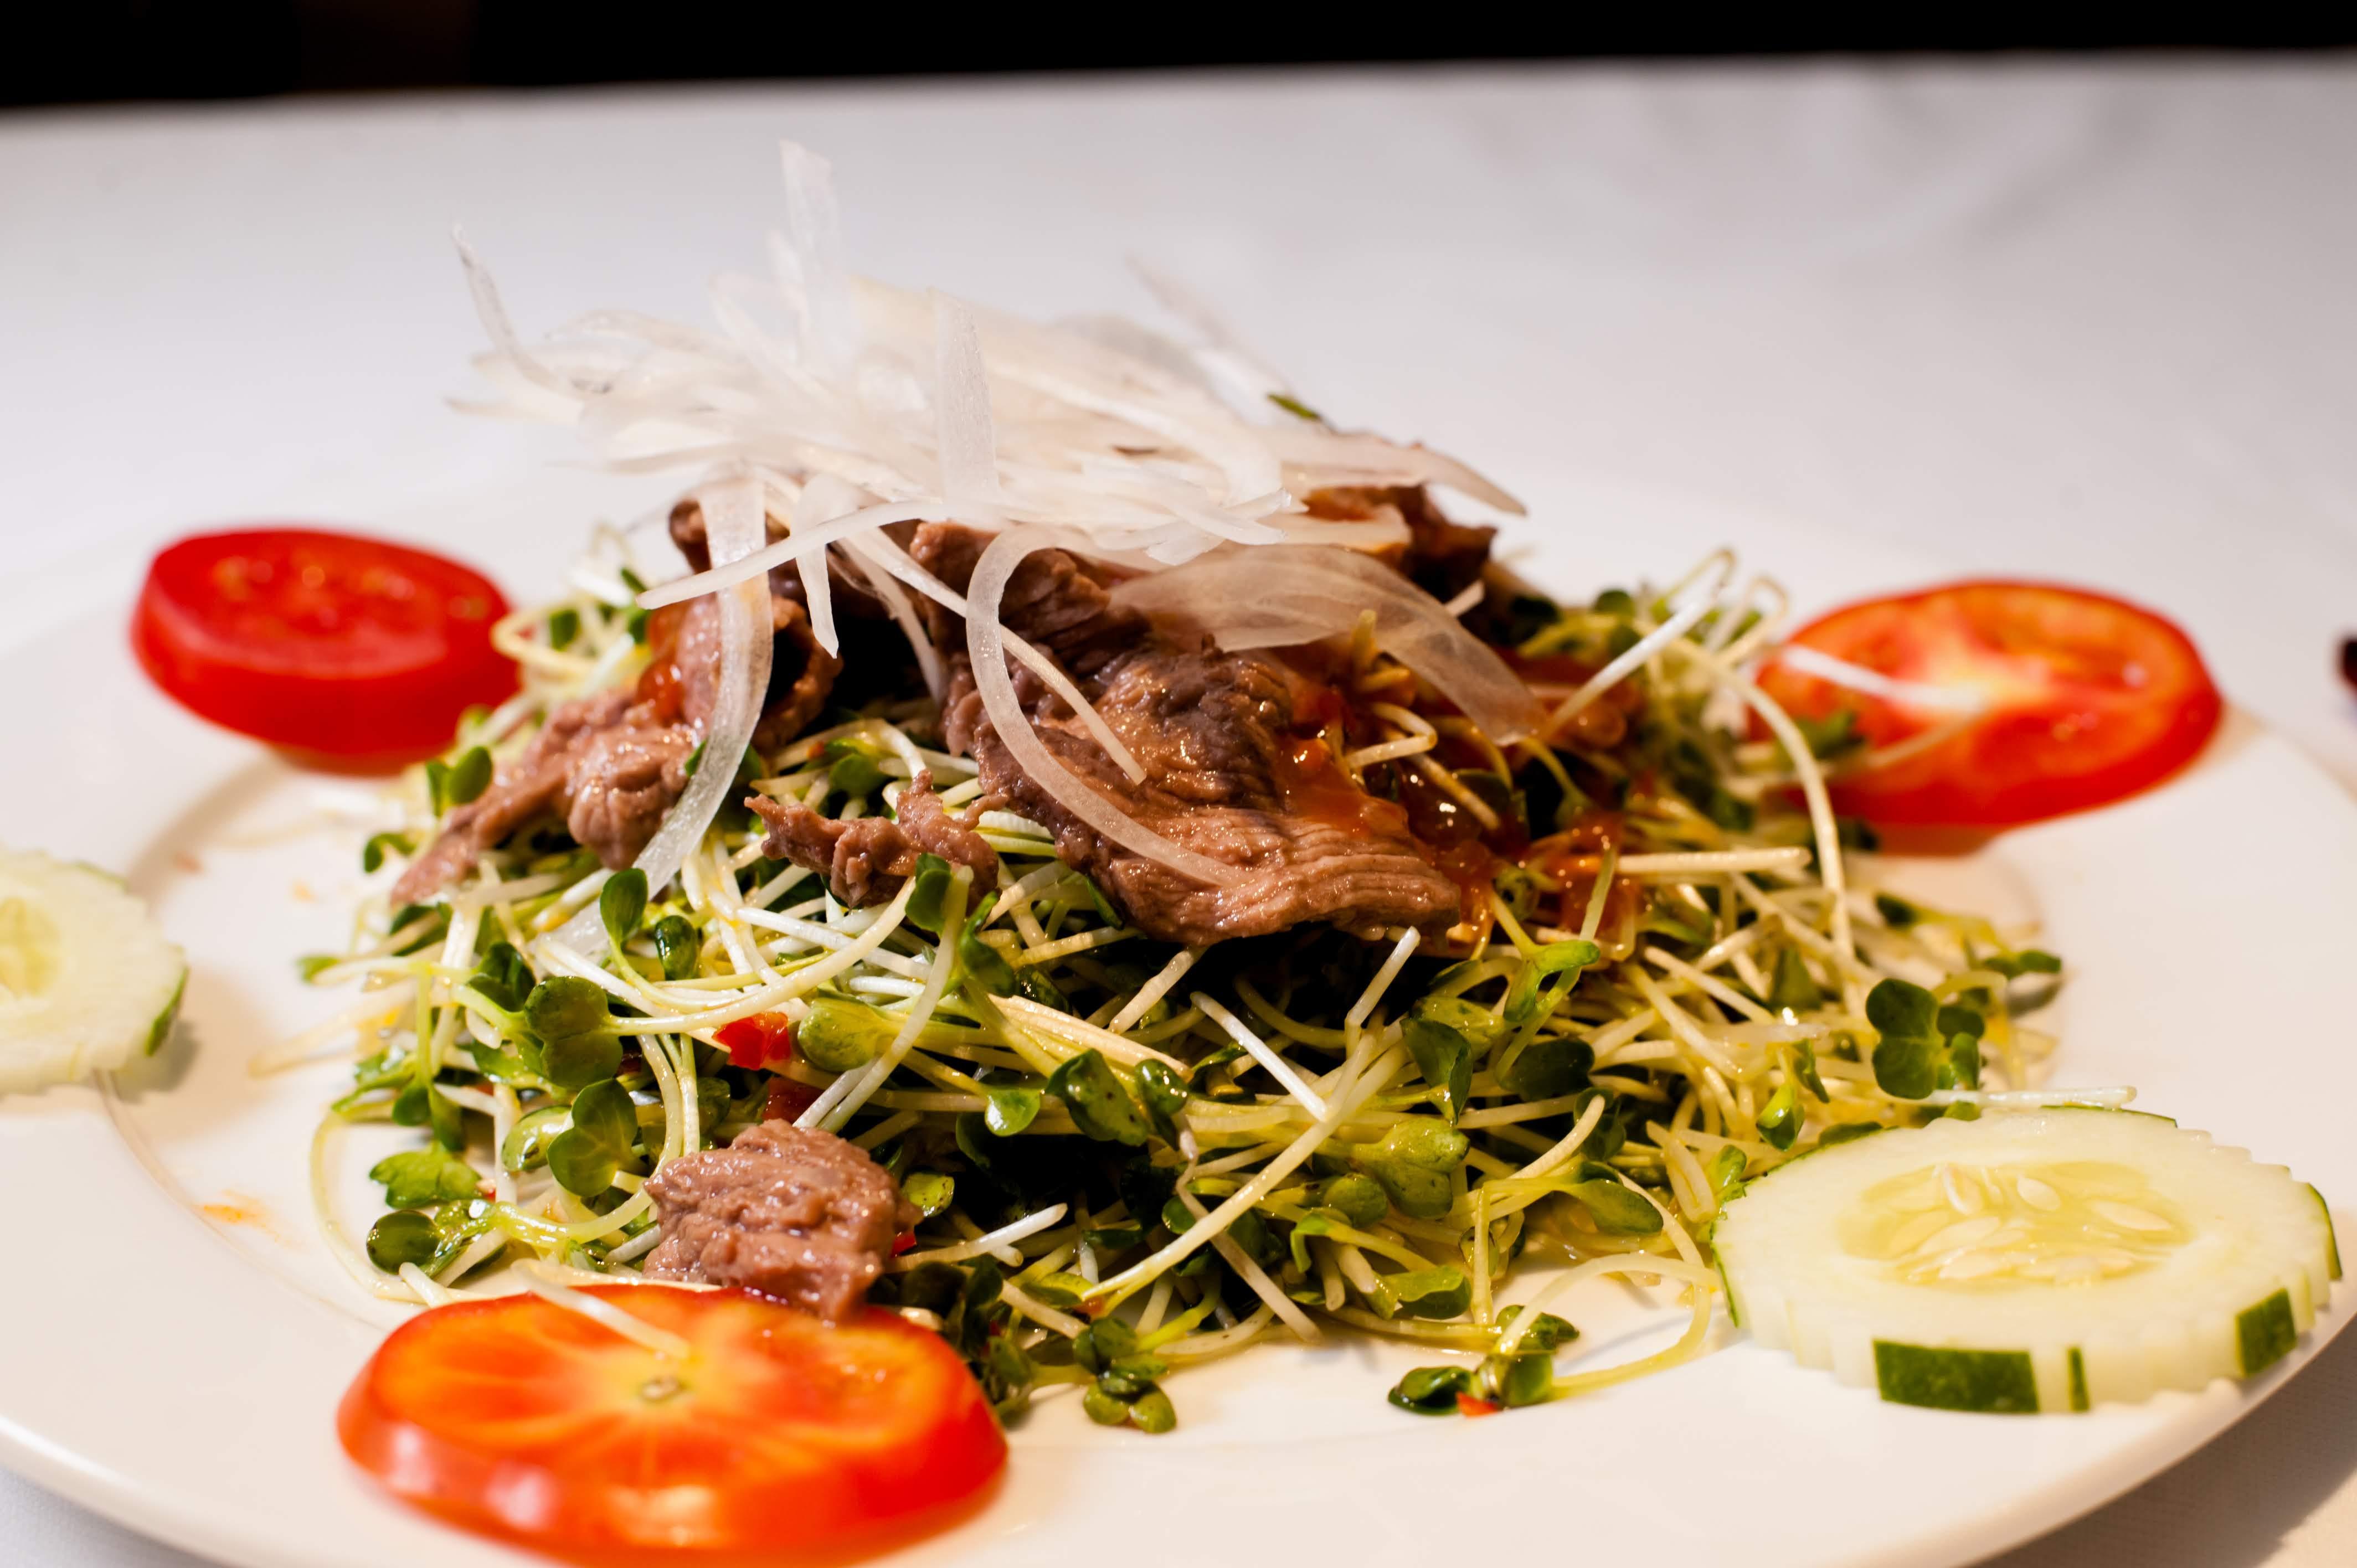 Mầm Cải Trộn Bò / Mustard green sprout and beef salad